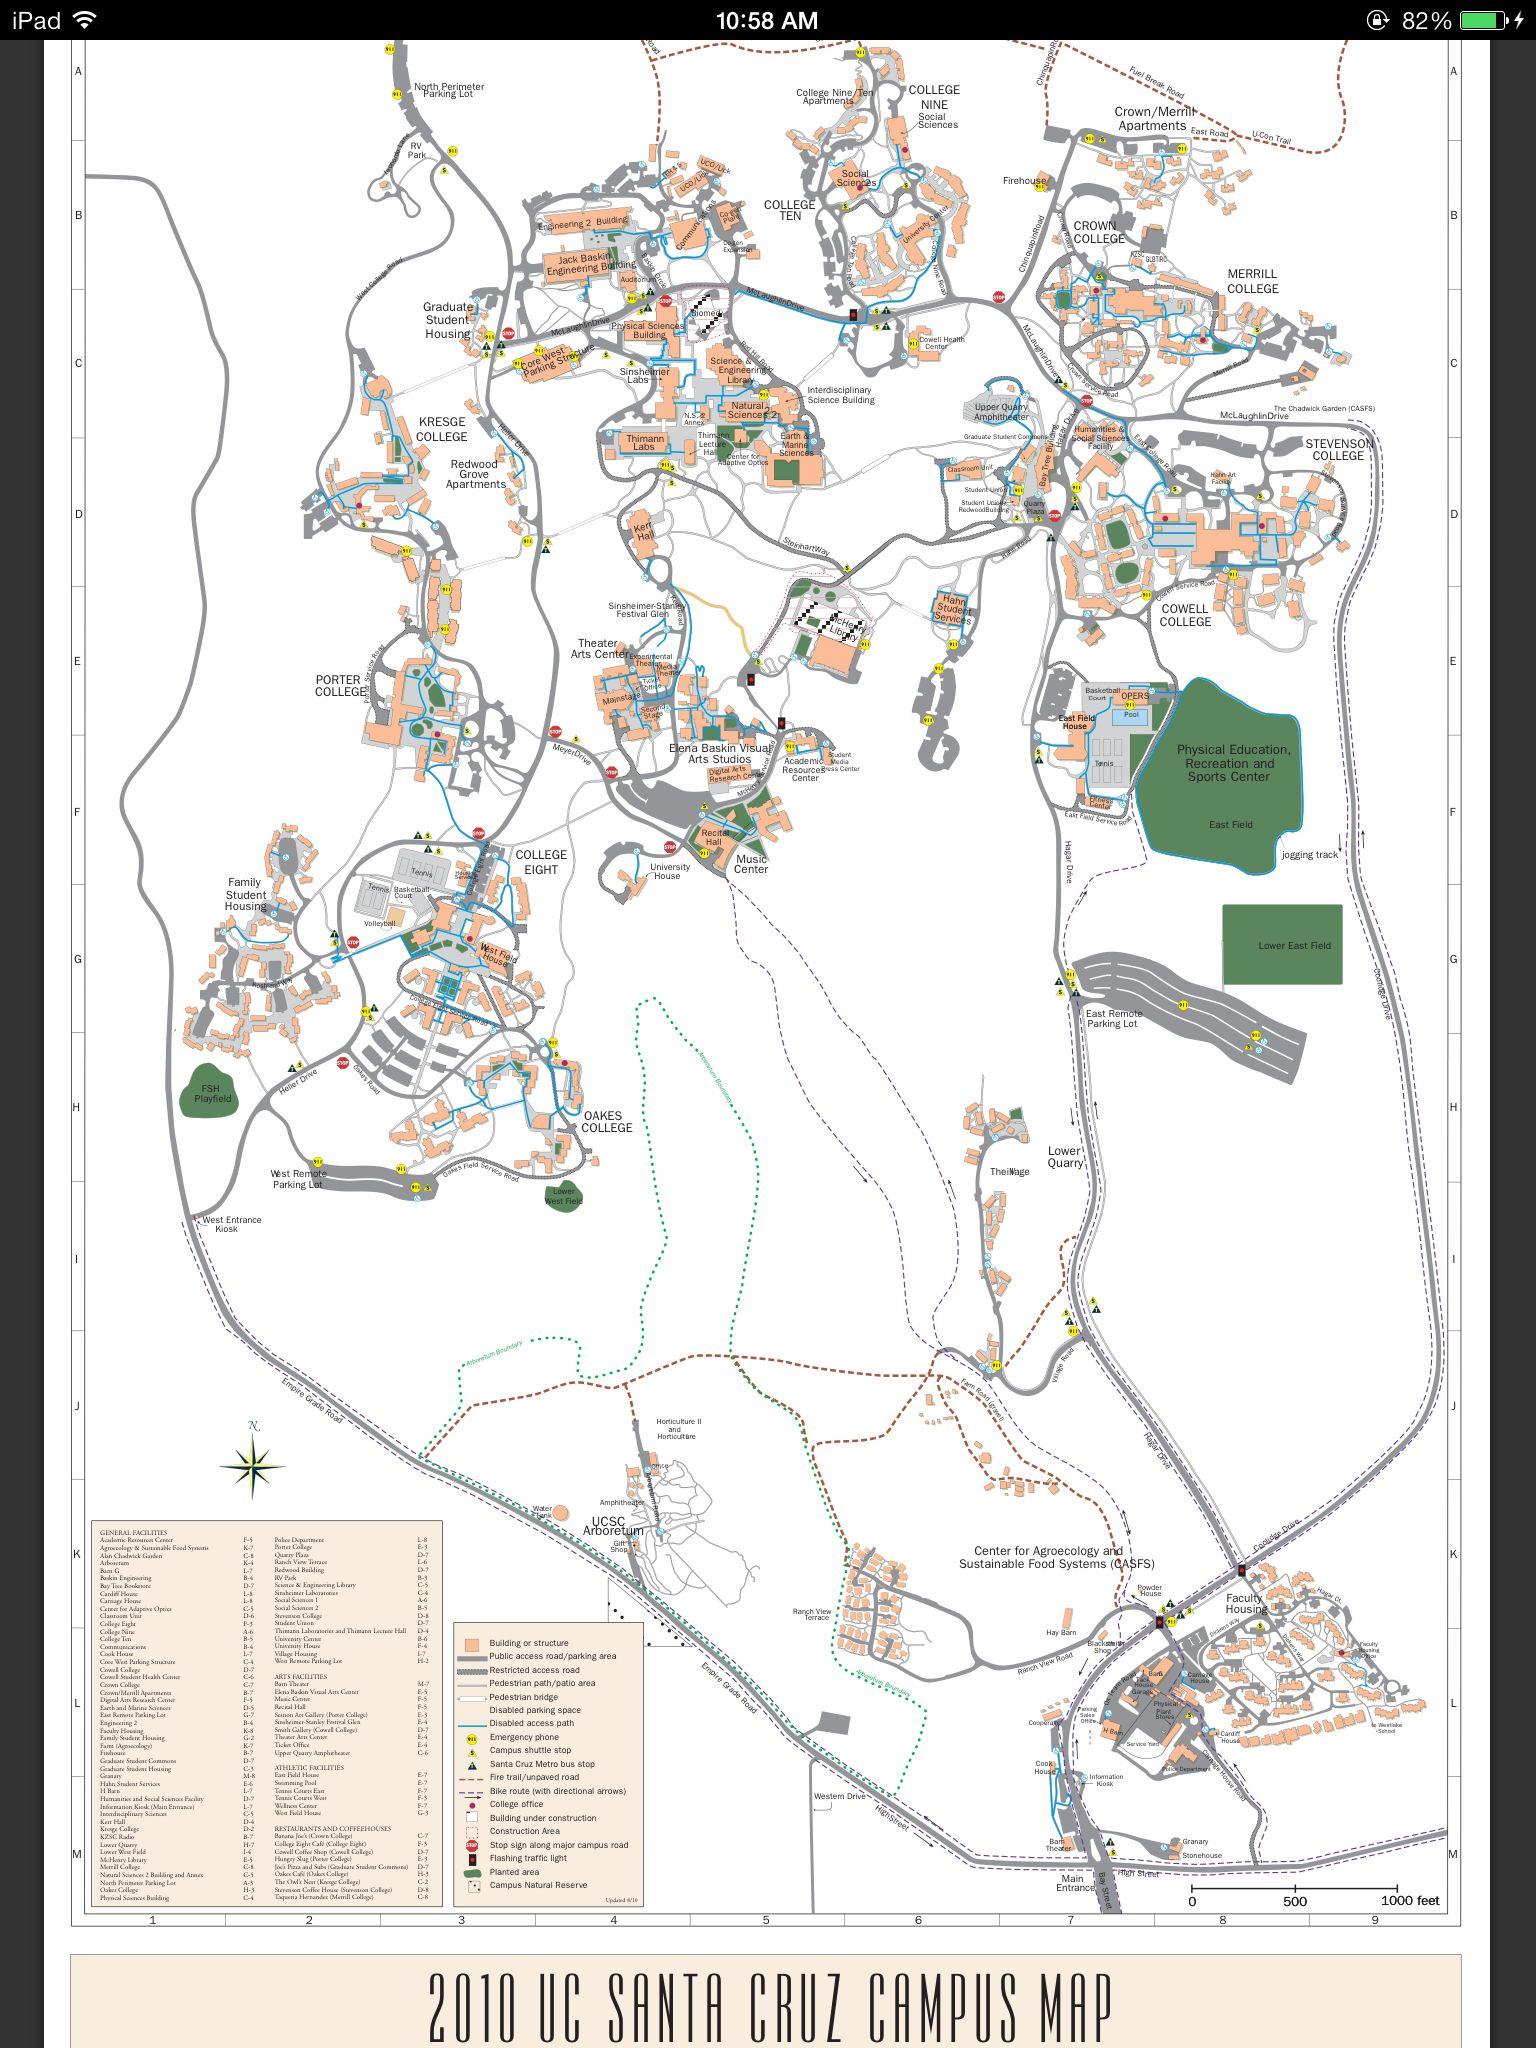 santa cruz university map Campus Map Campus Map College Tour Map santa cruz university map